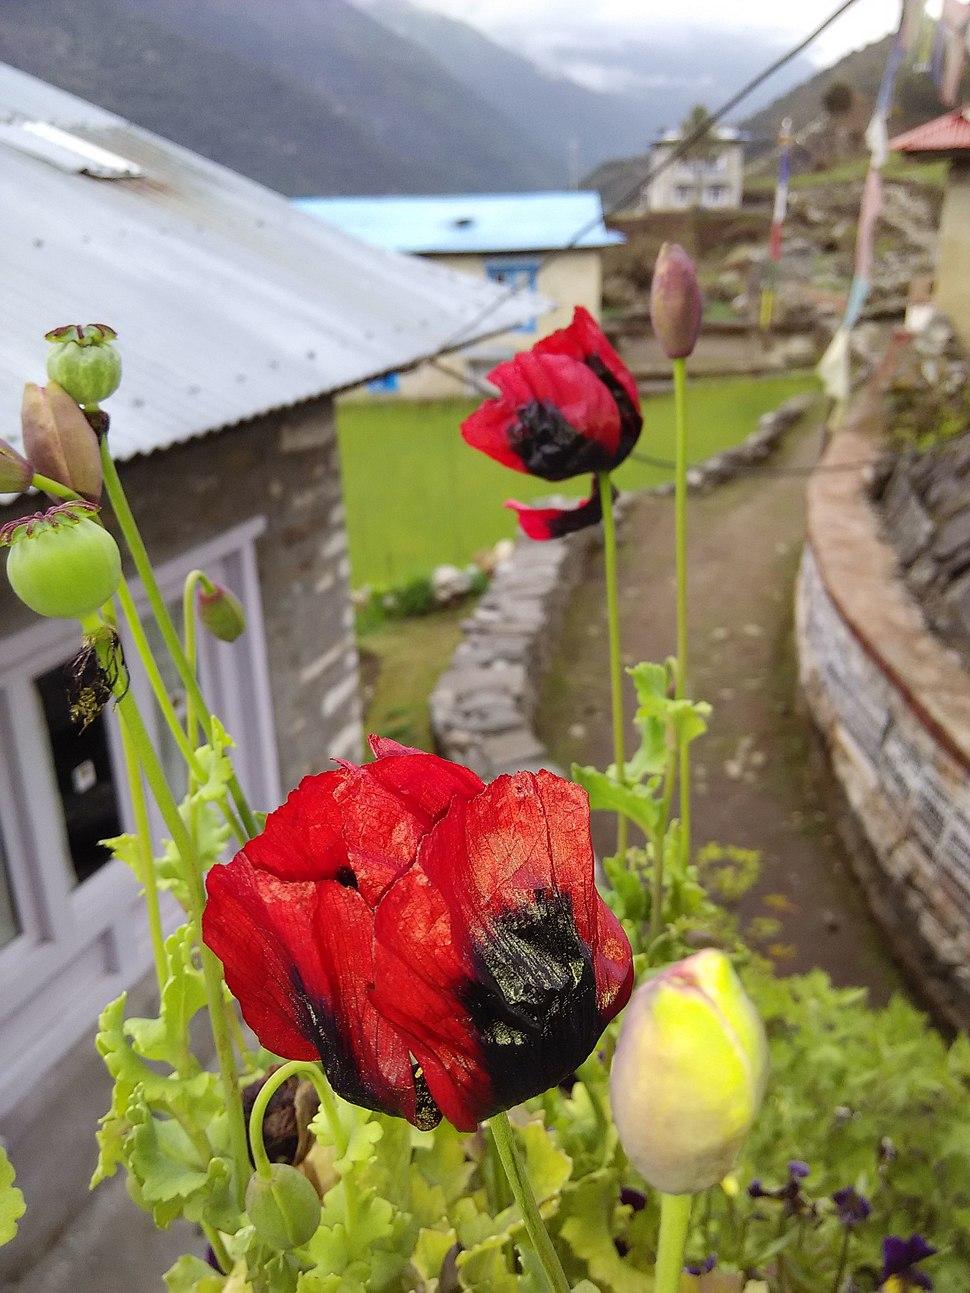 Opium poppy seed and flower at Budhha lodge of Chaurikharka,Nepal